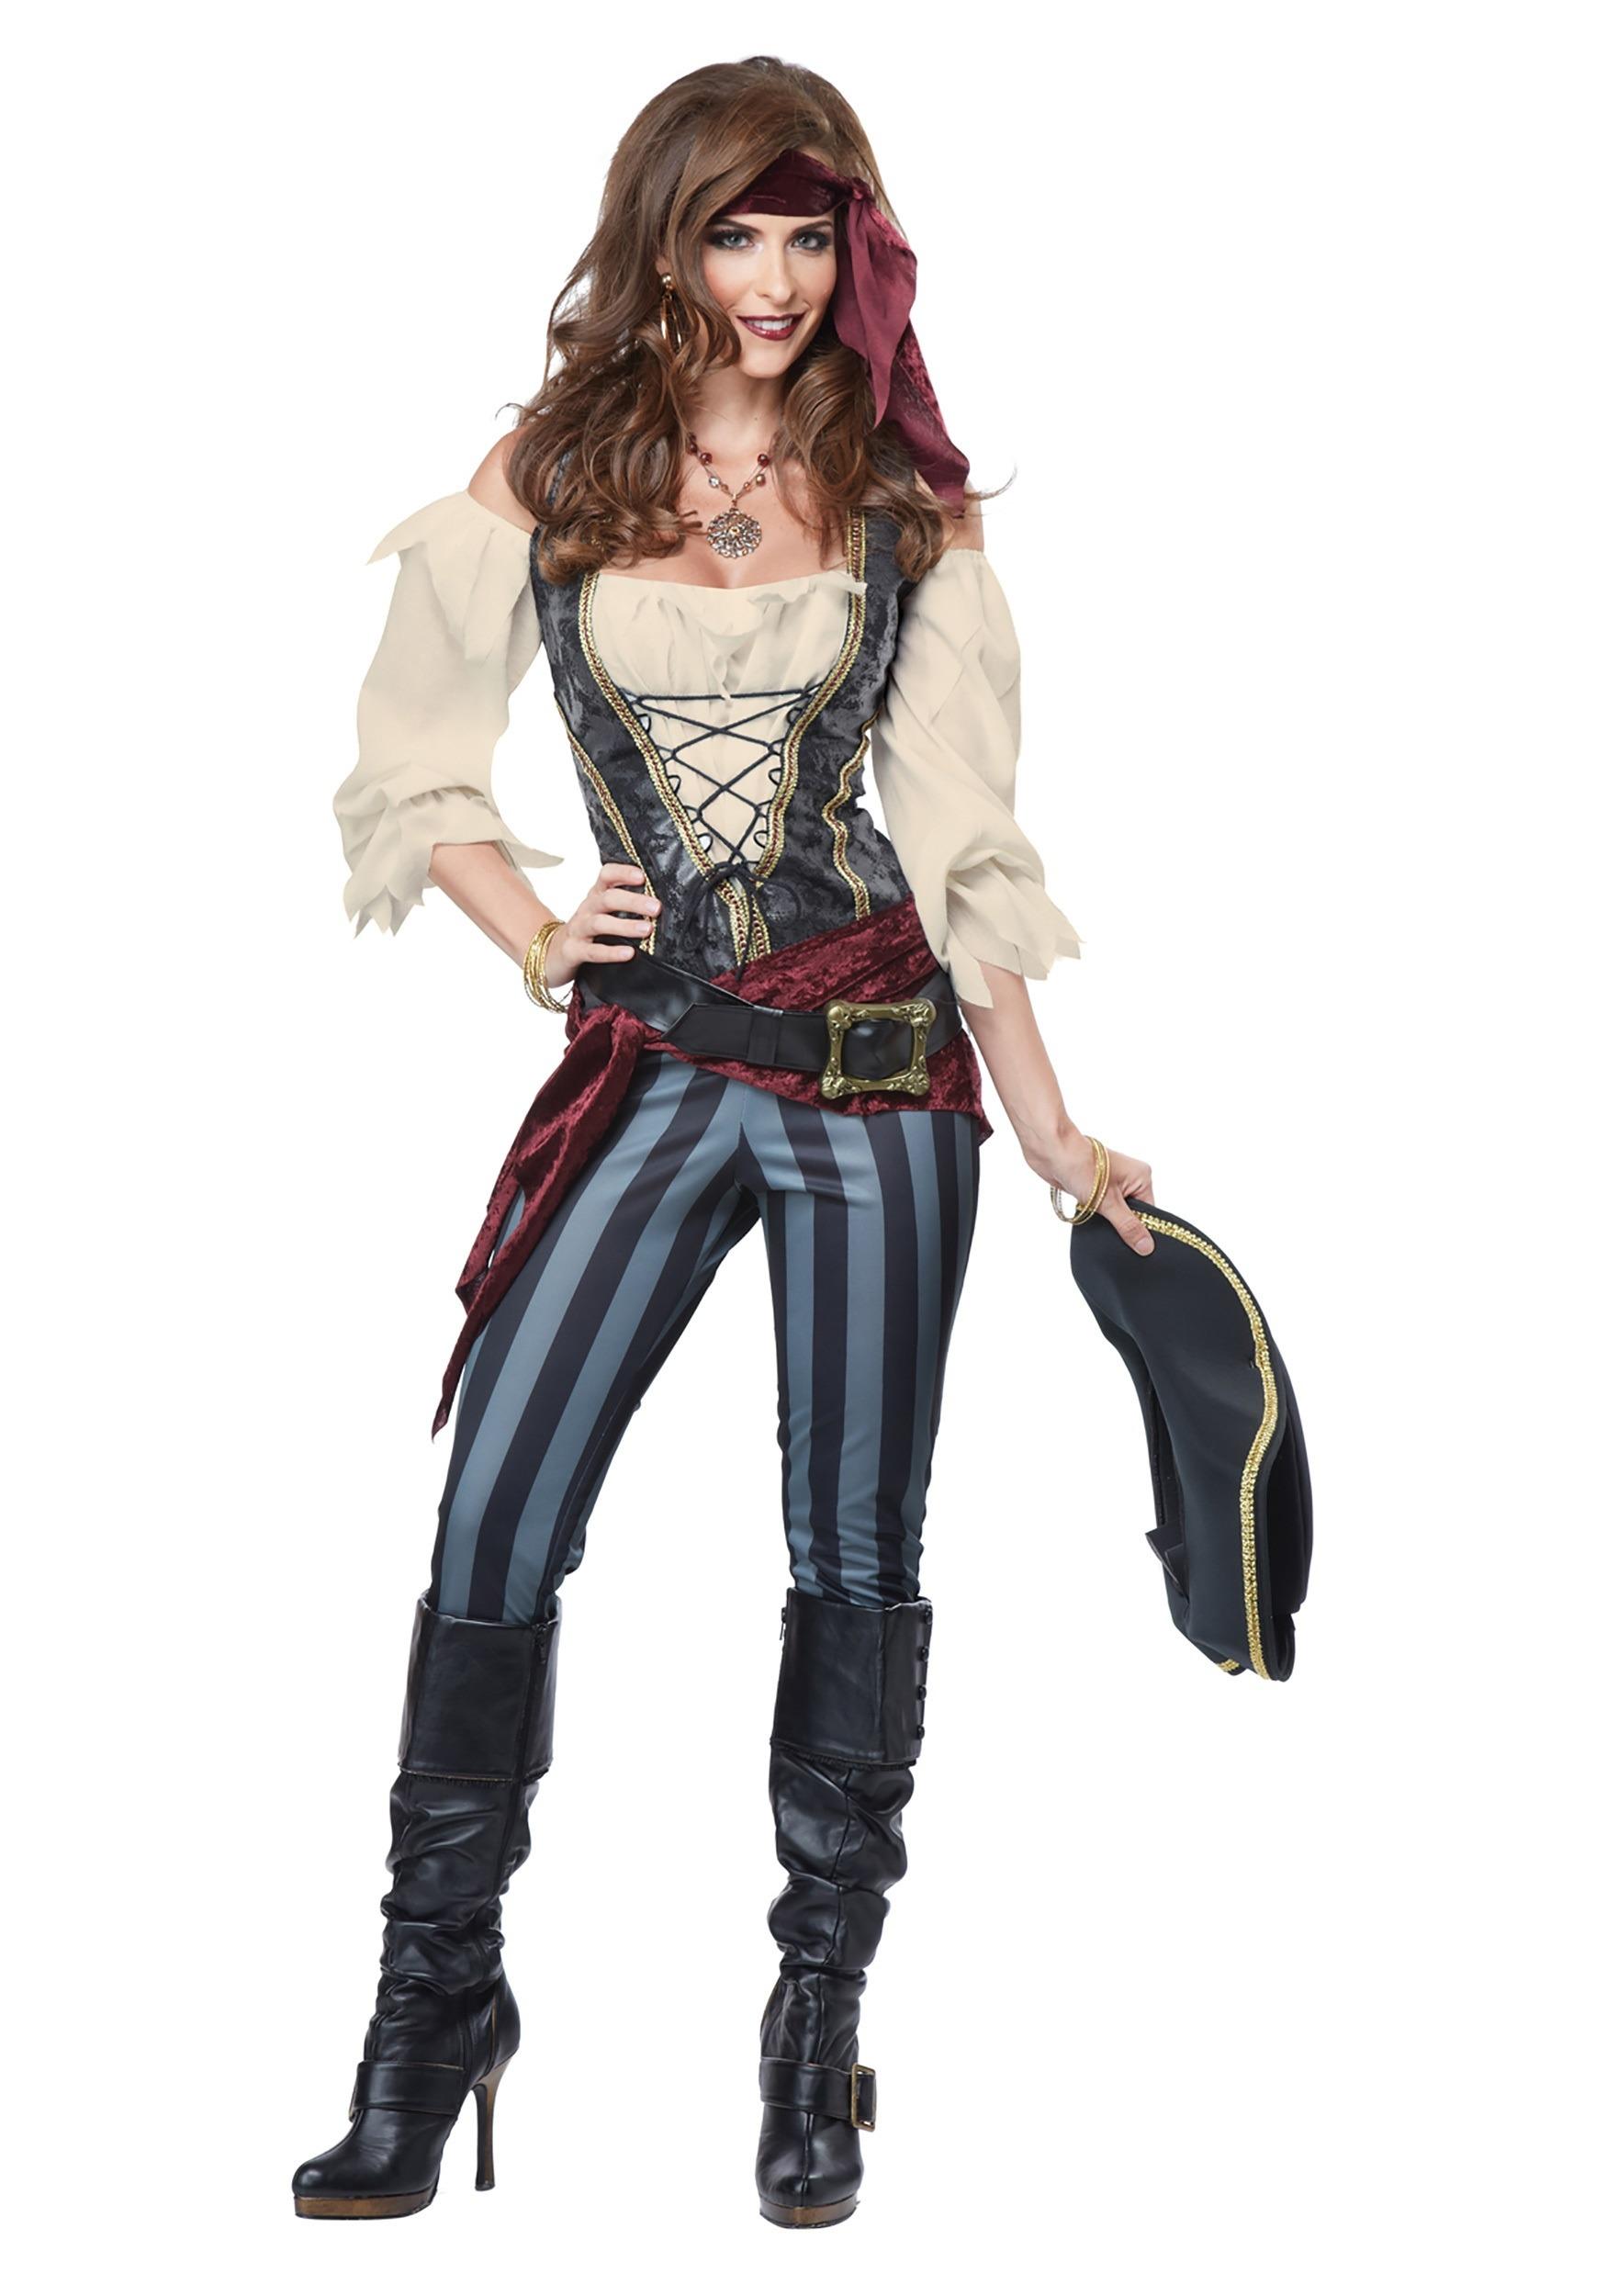 Lady Pirate Womens Adult Buccaneer Maiden Halloween Costume